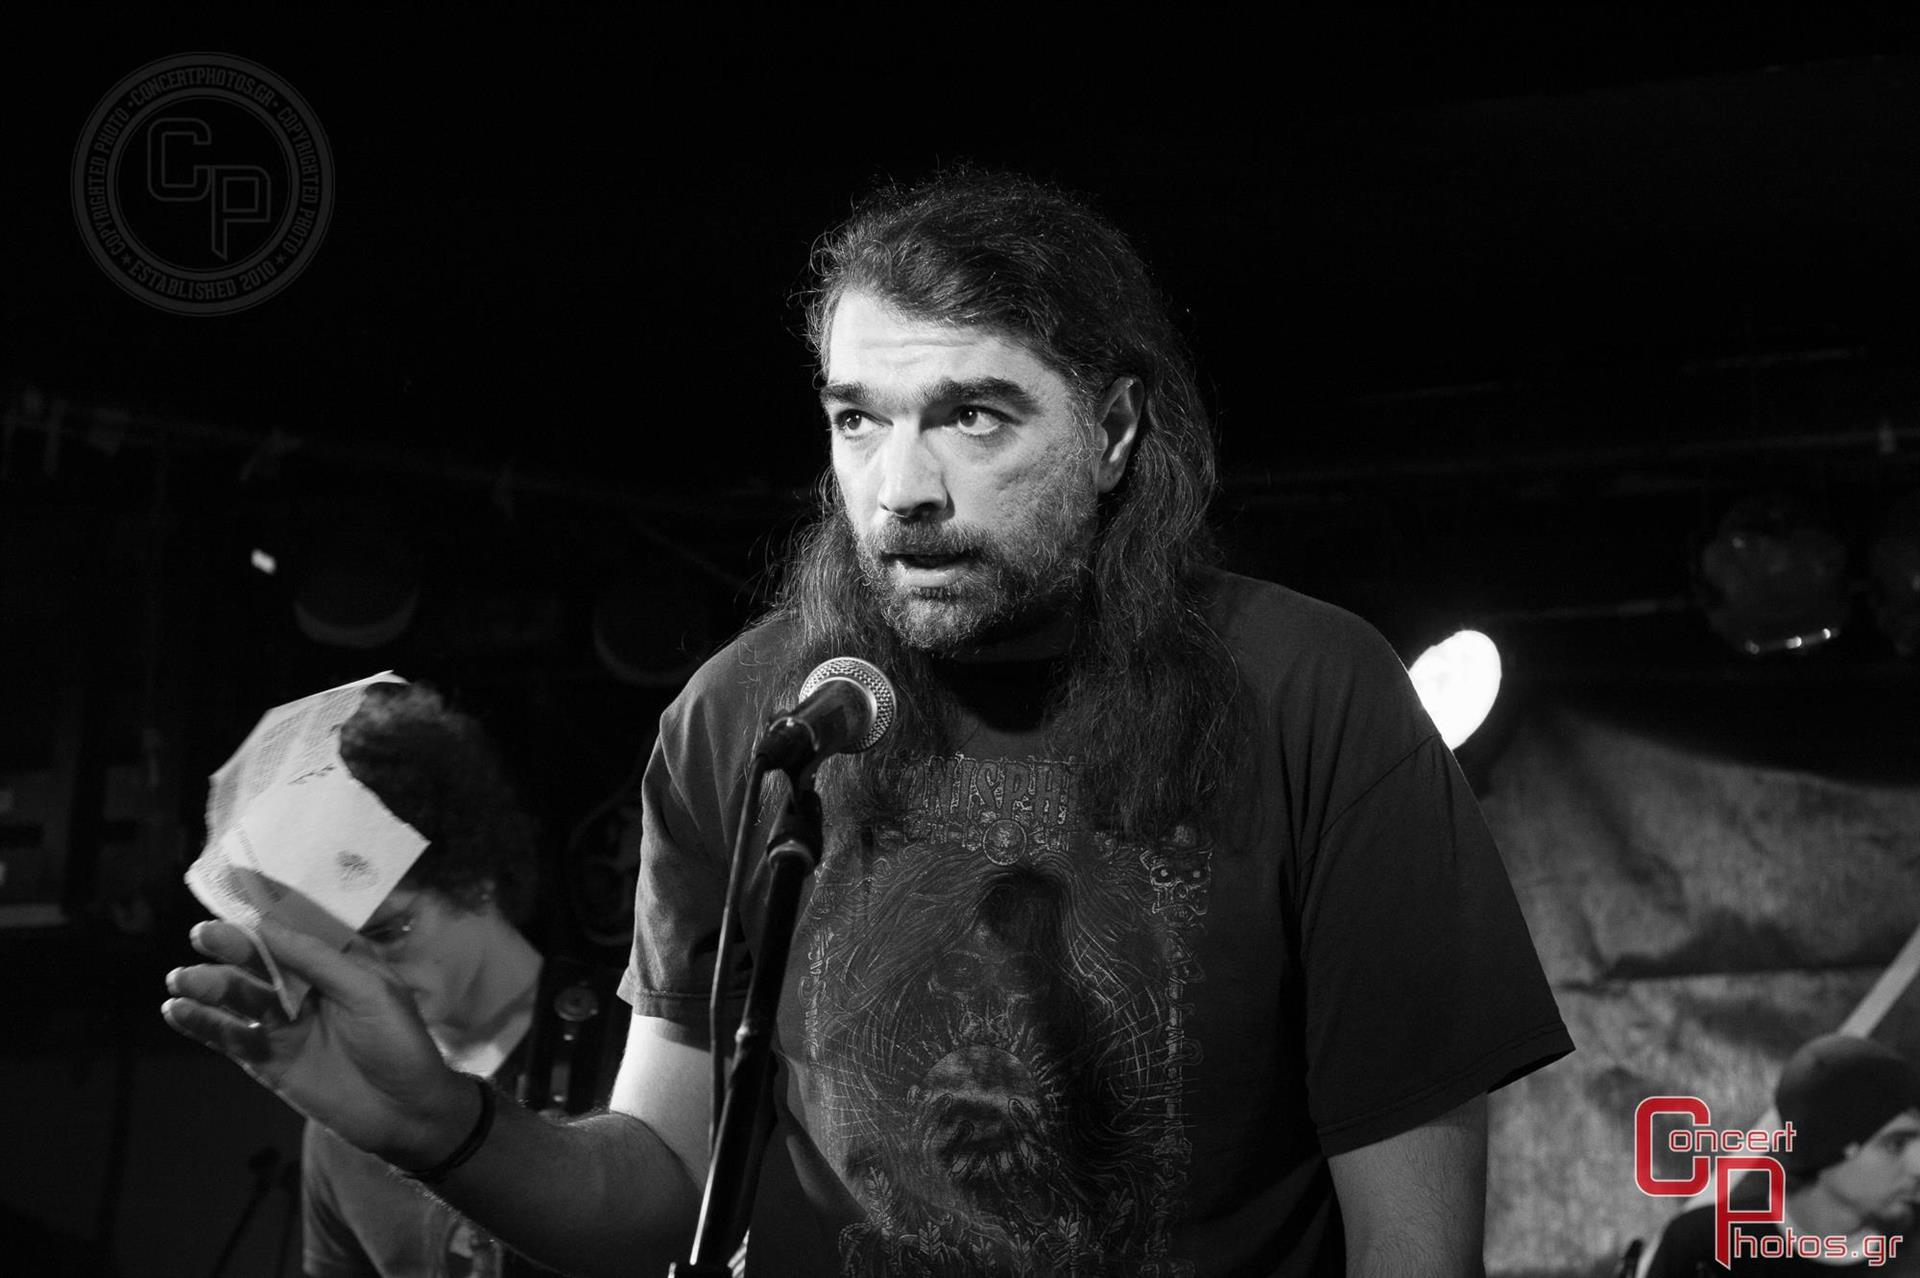 Battle Of The Bands Athens - Leg 3- photographer:  - ConcertPhotos - 20150104_2134_56